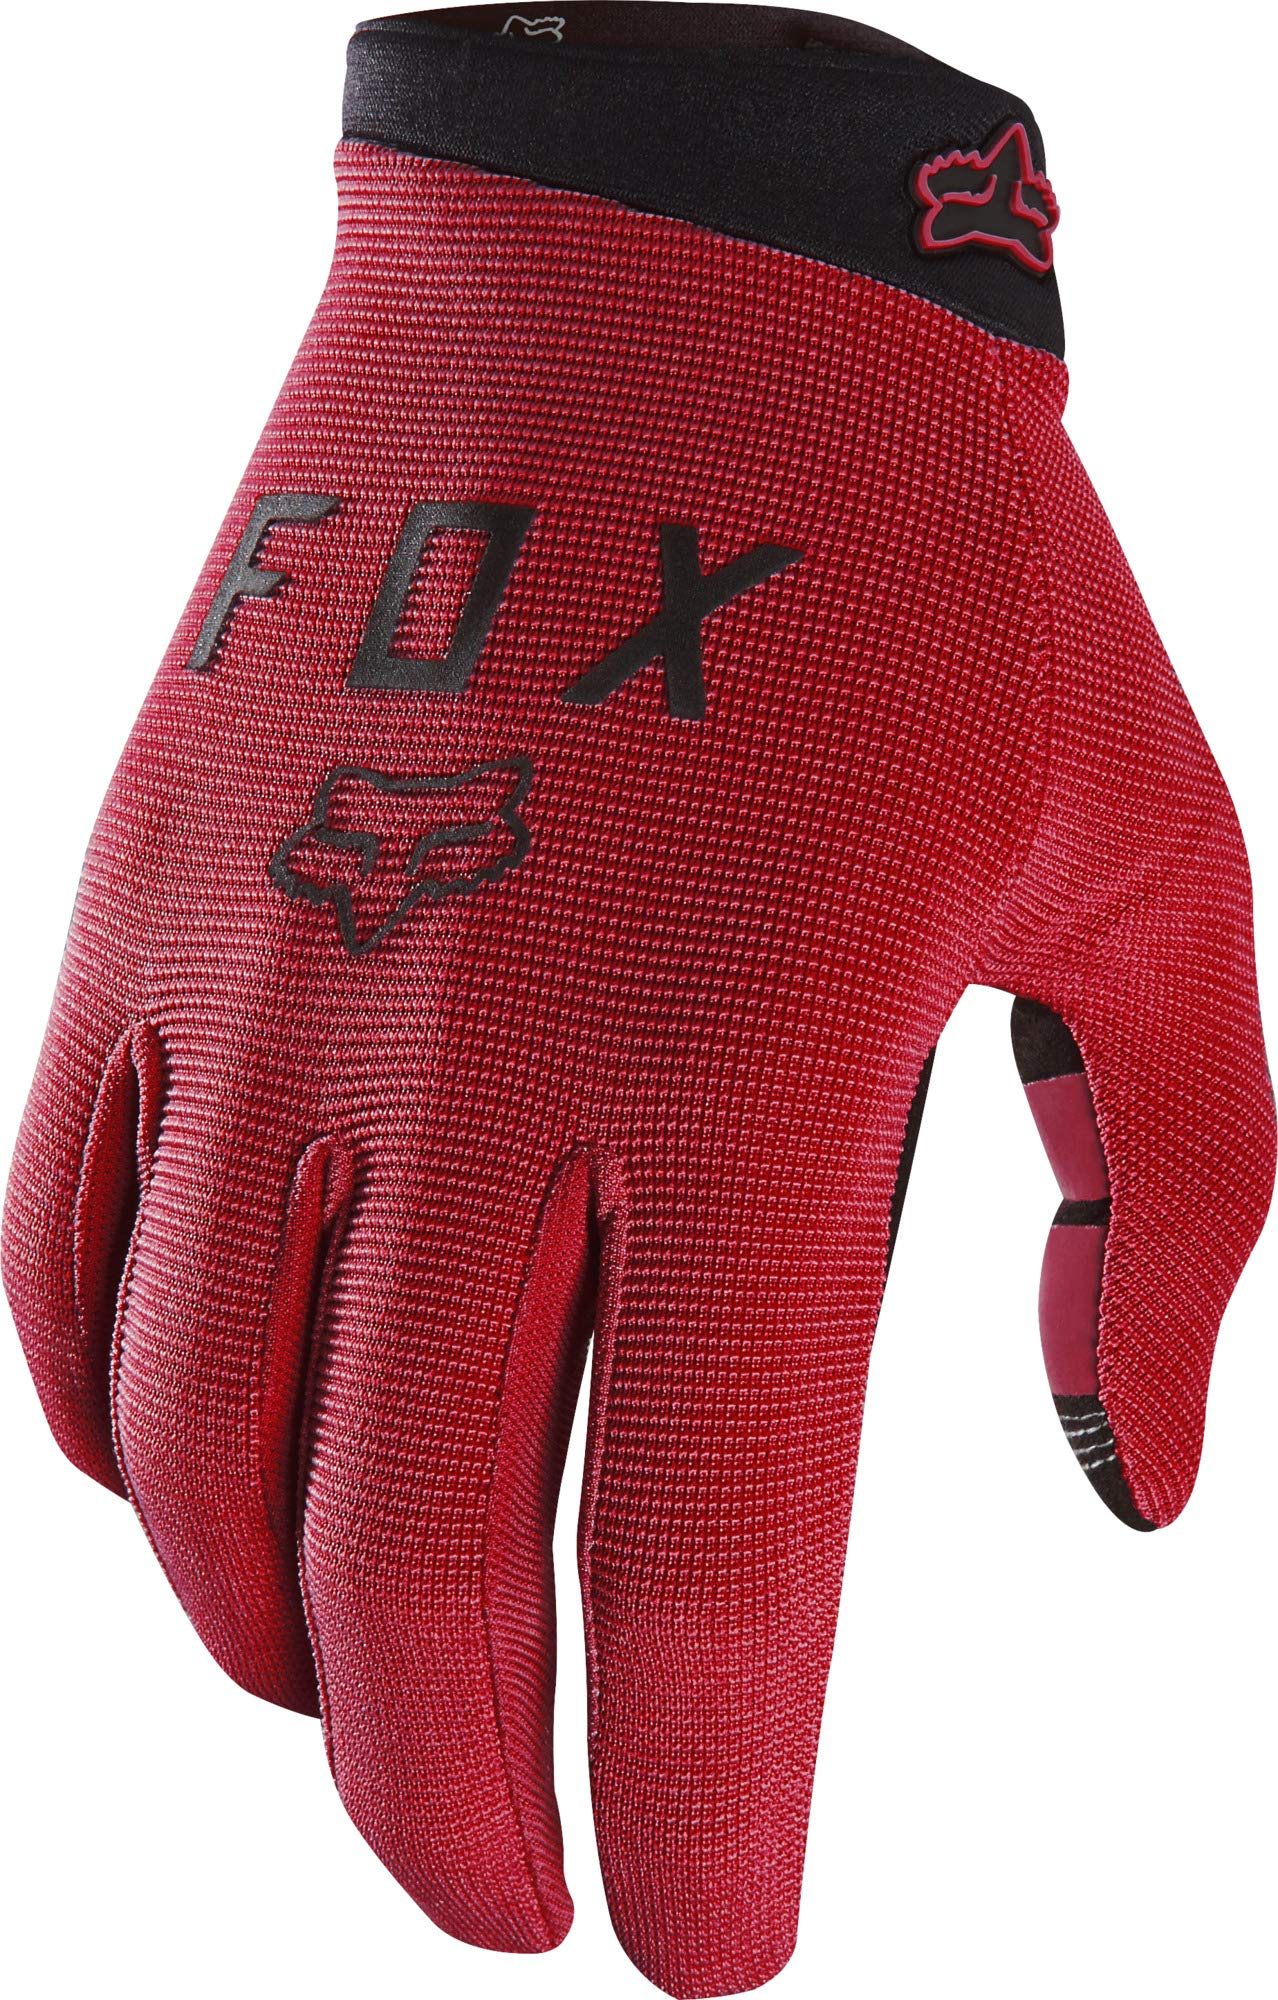 Fox Racing Ranger Glove - Men's Cardinal, M